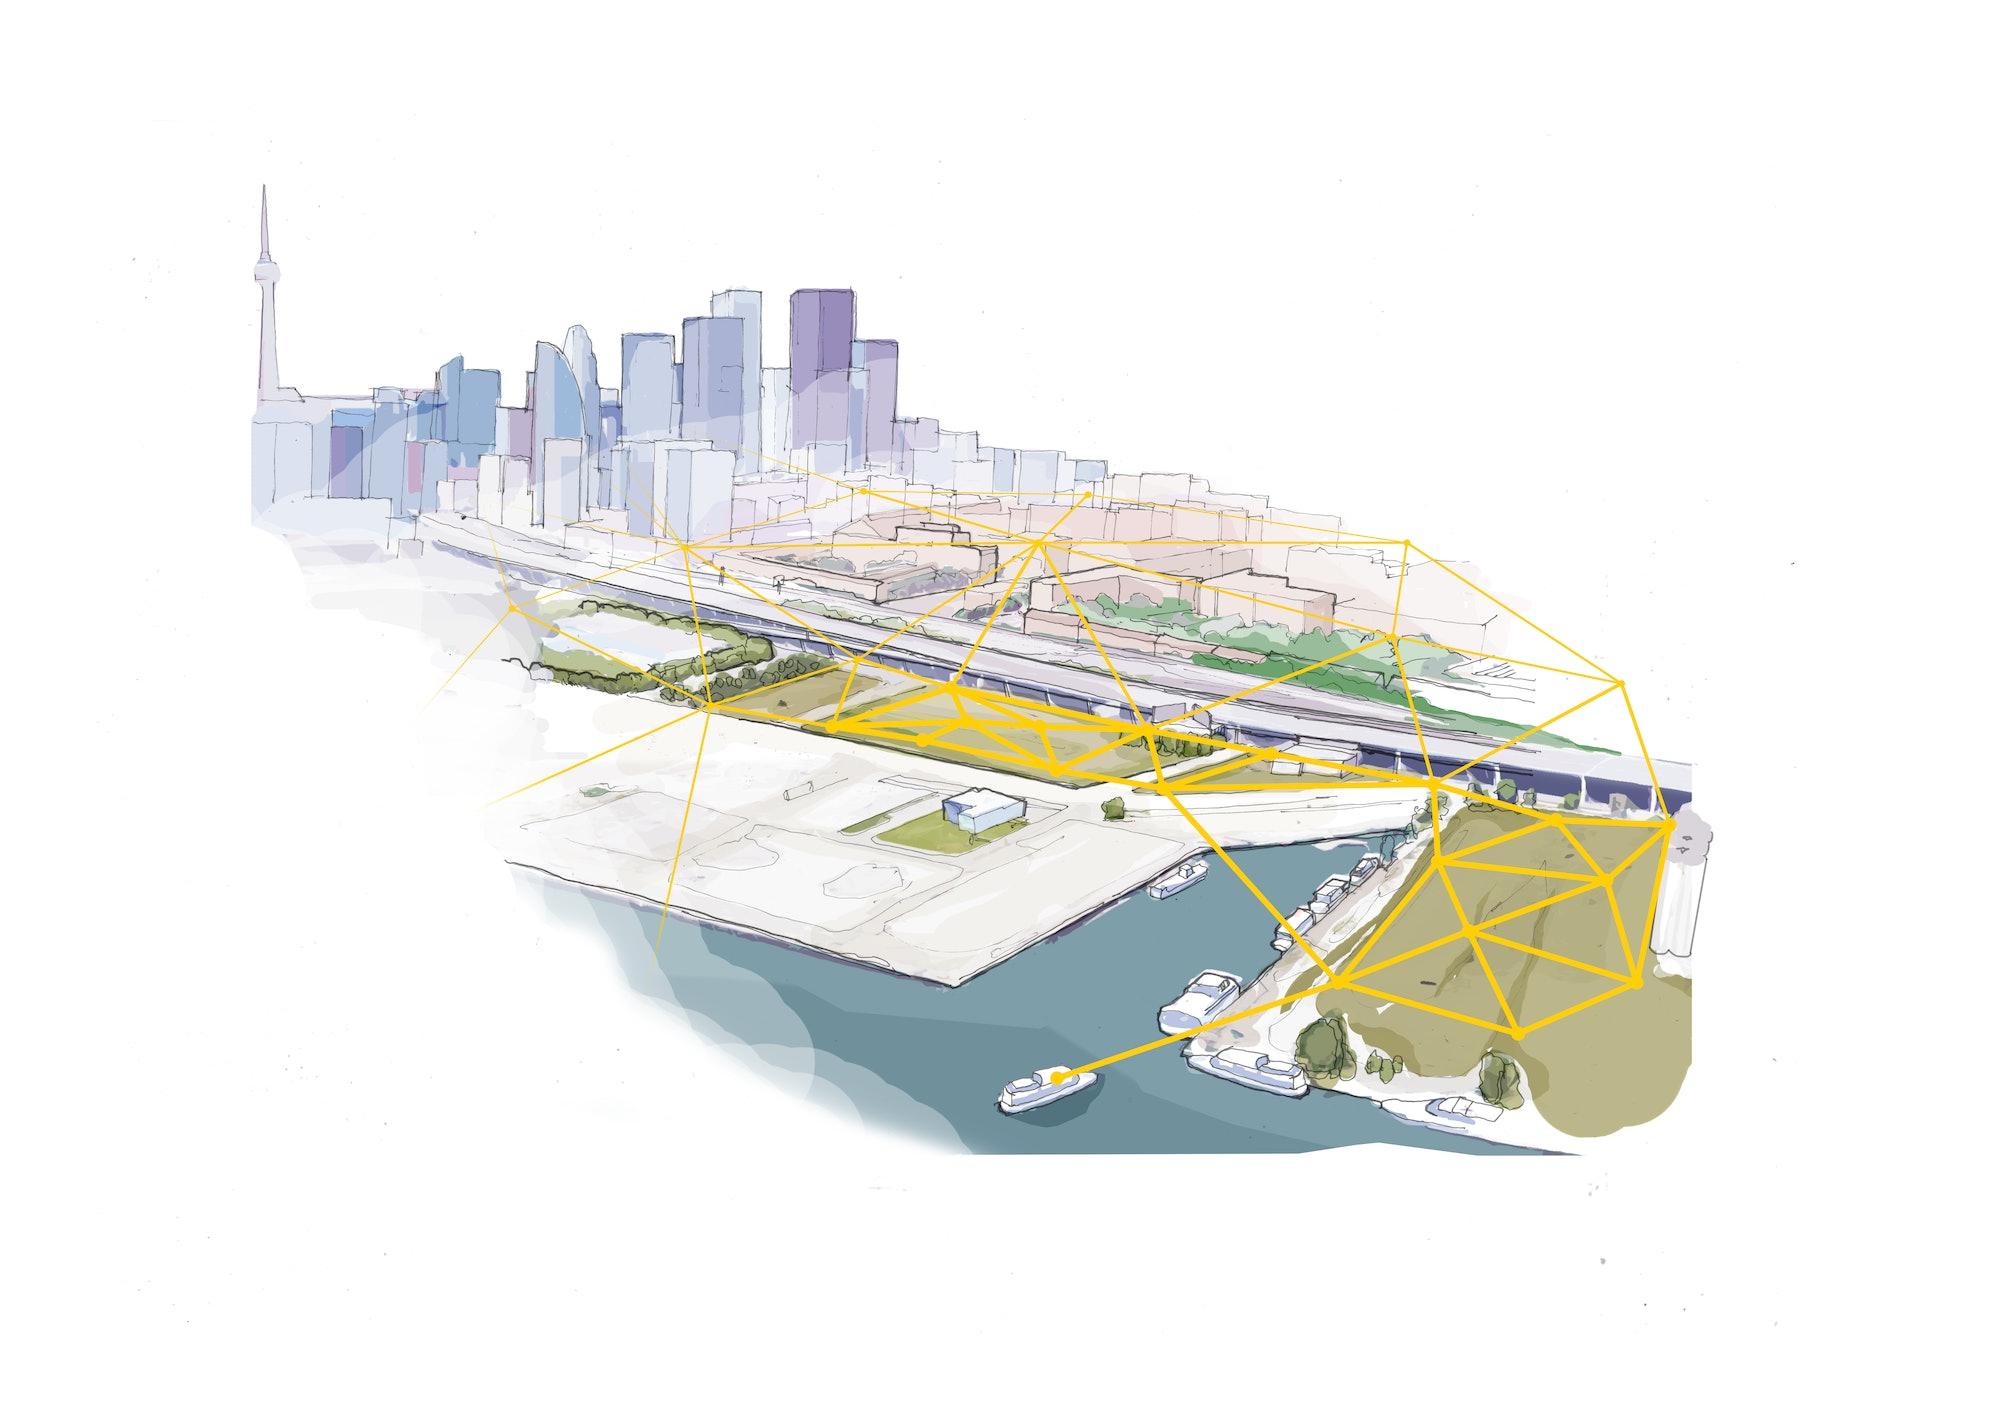 Quayside Sidewalk Labs Google Toronto Smart Cities Dystopia Orwell